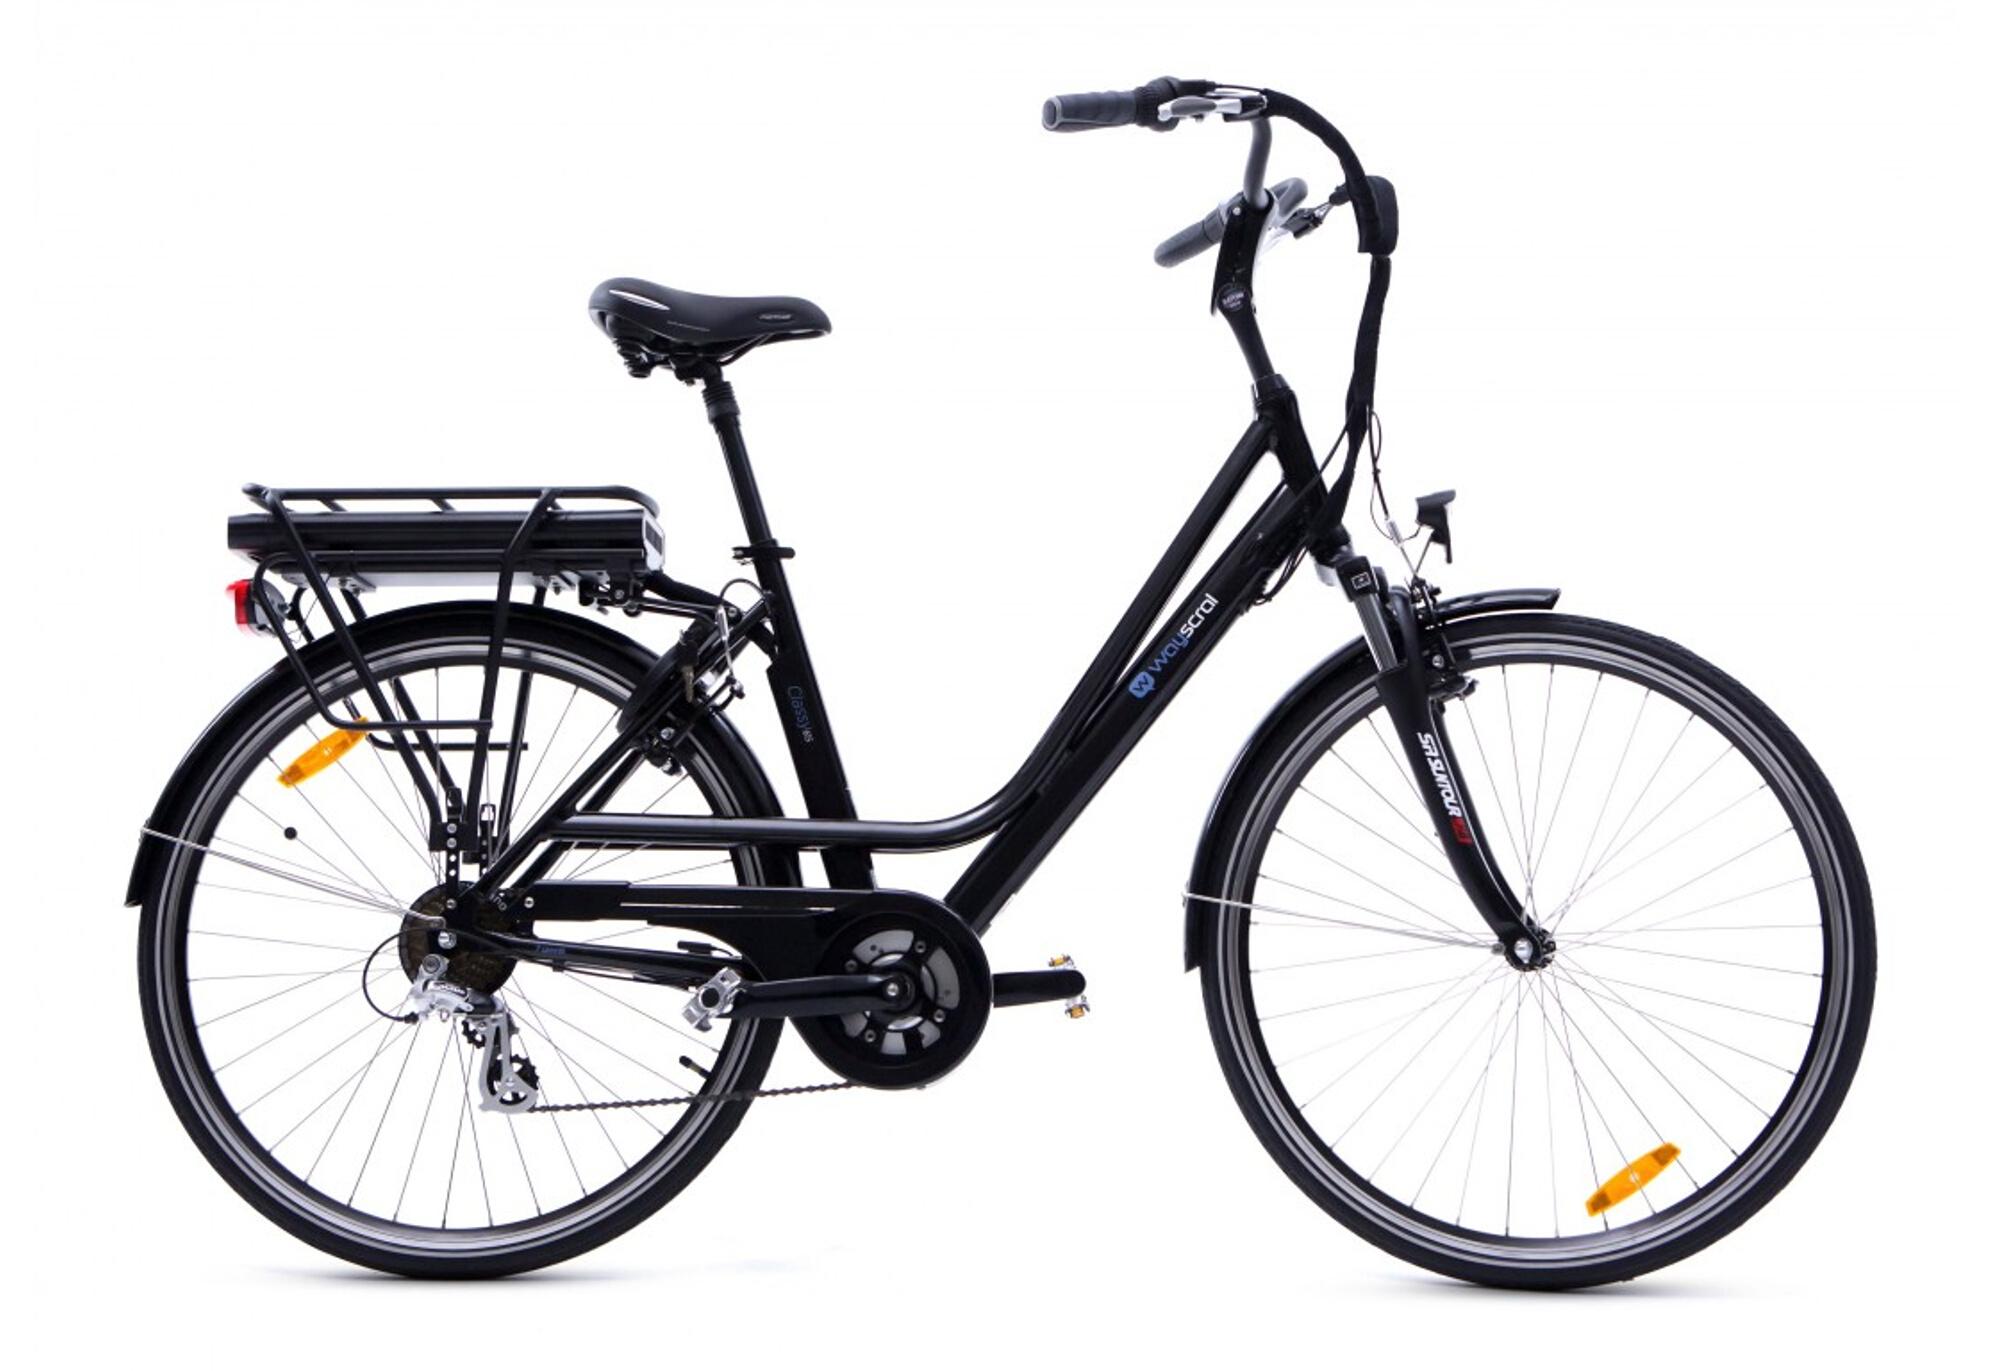 Wayscral Classy 615 36v 6 6ah 27 5 Urban E Bike Shimano Altus 7v Black